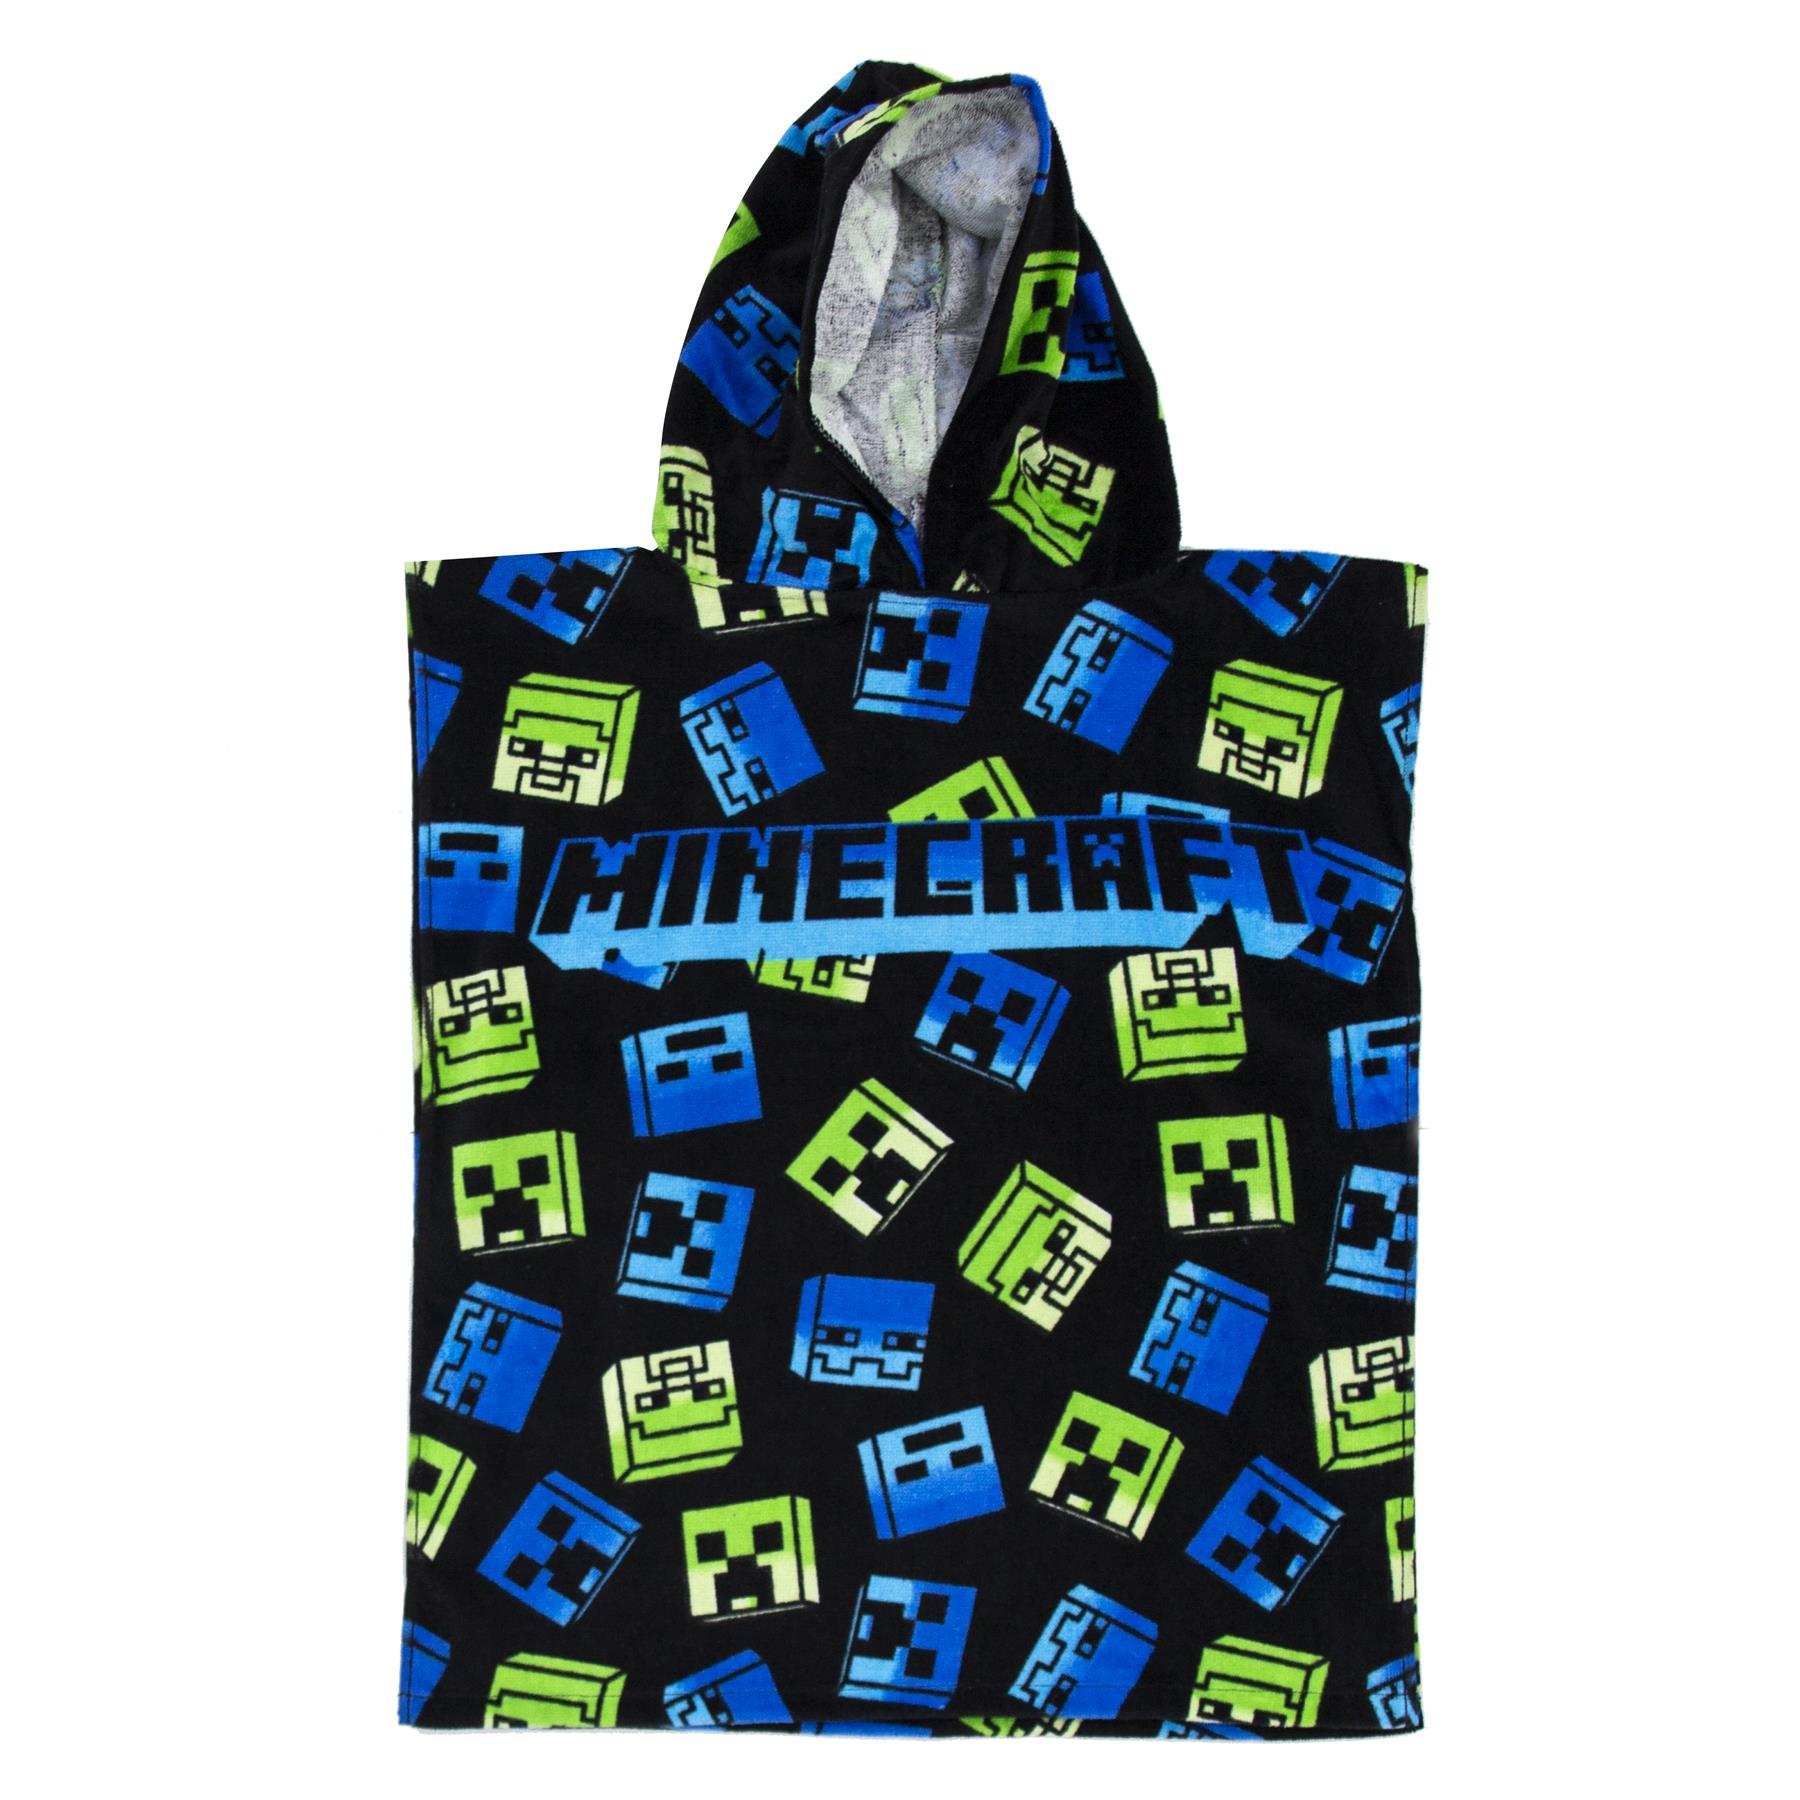 miniatura 10 - Minecraft Biancheria da letto Creeper PIUMONI Asciugamano Cuscino Coperta-venduta separatamente